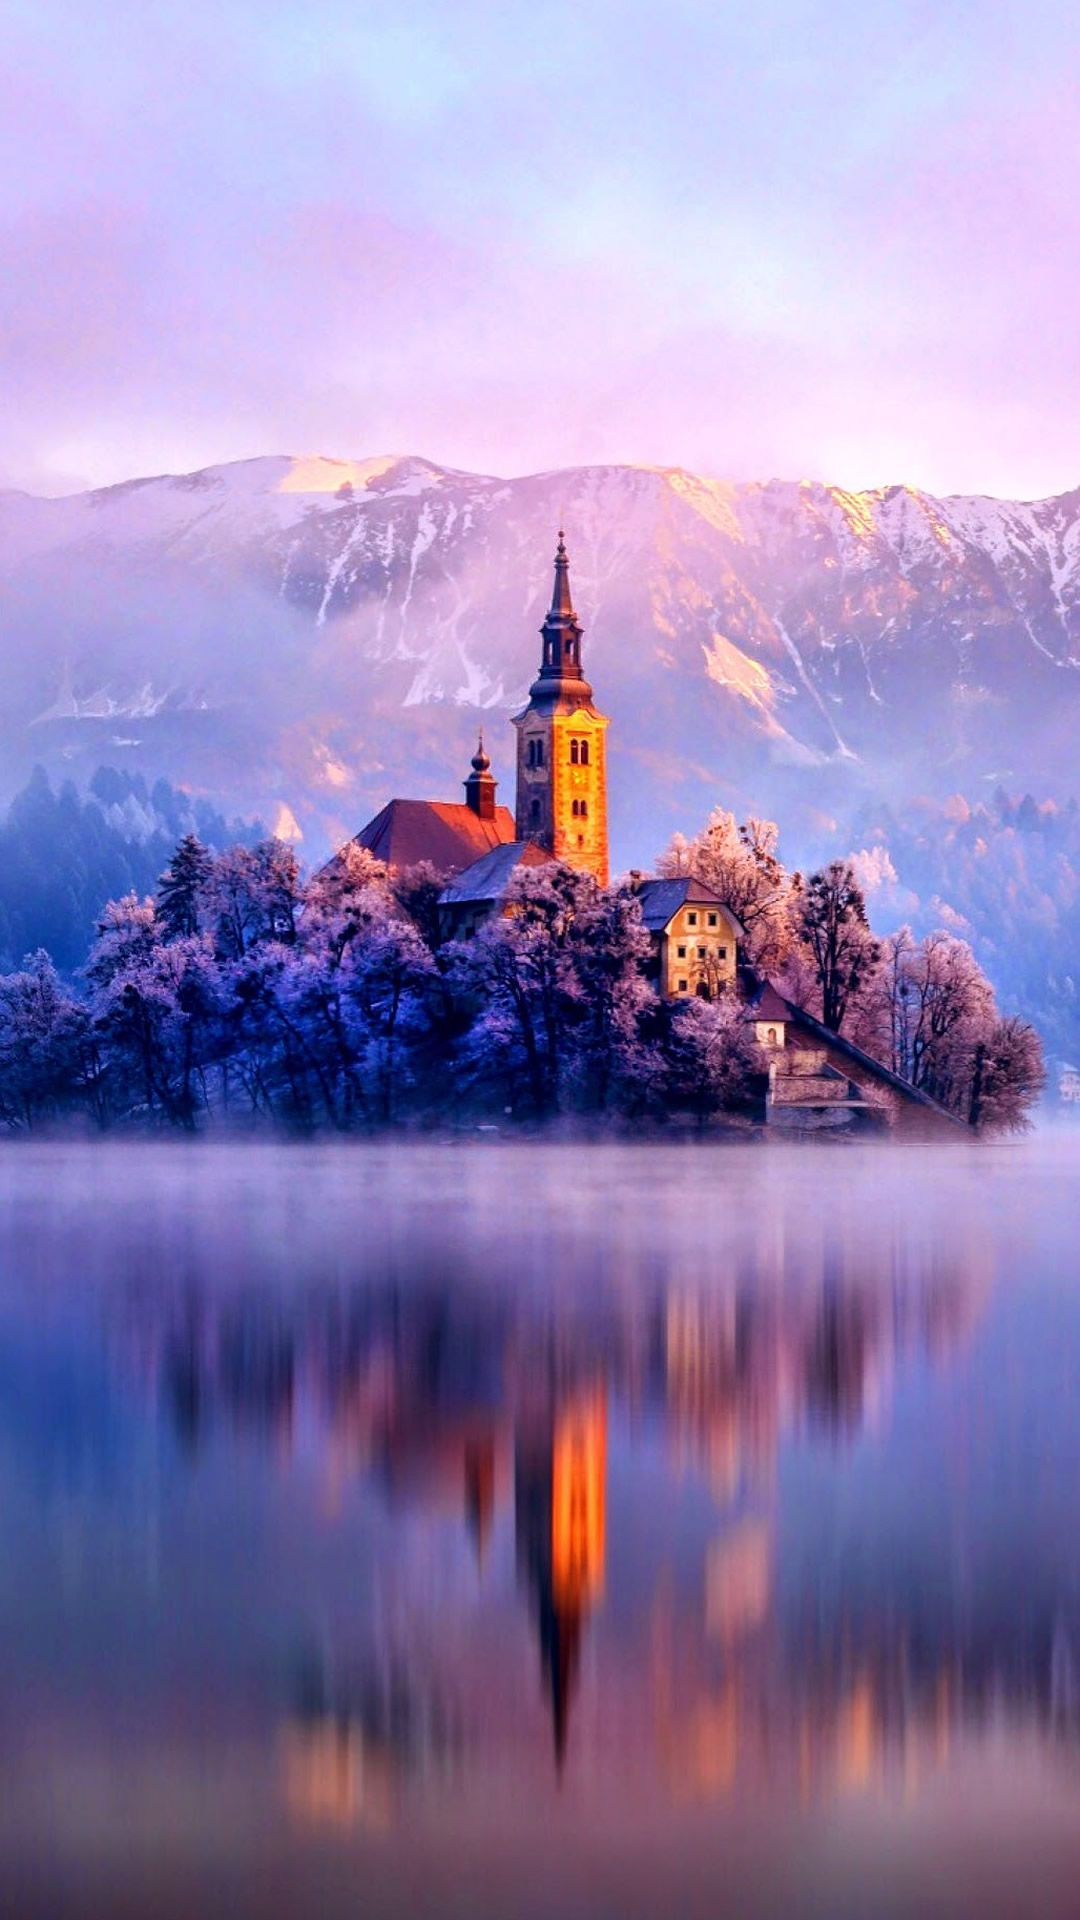 Church of the Assumption Lake Bled, Slovenia 風景, 庭作りの